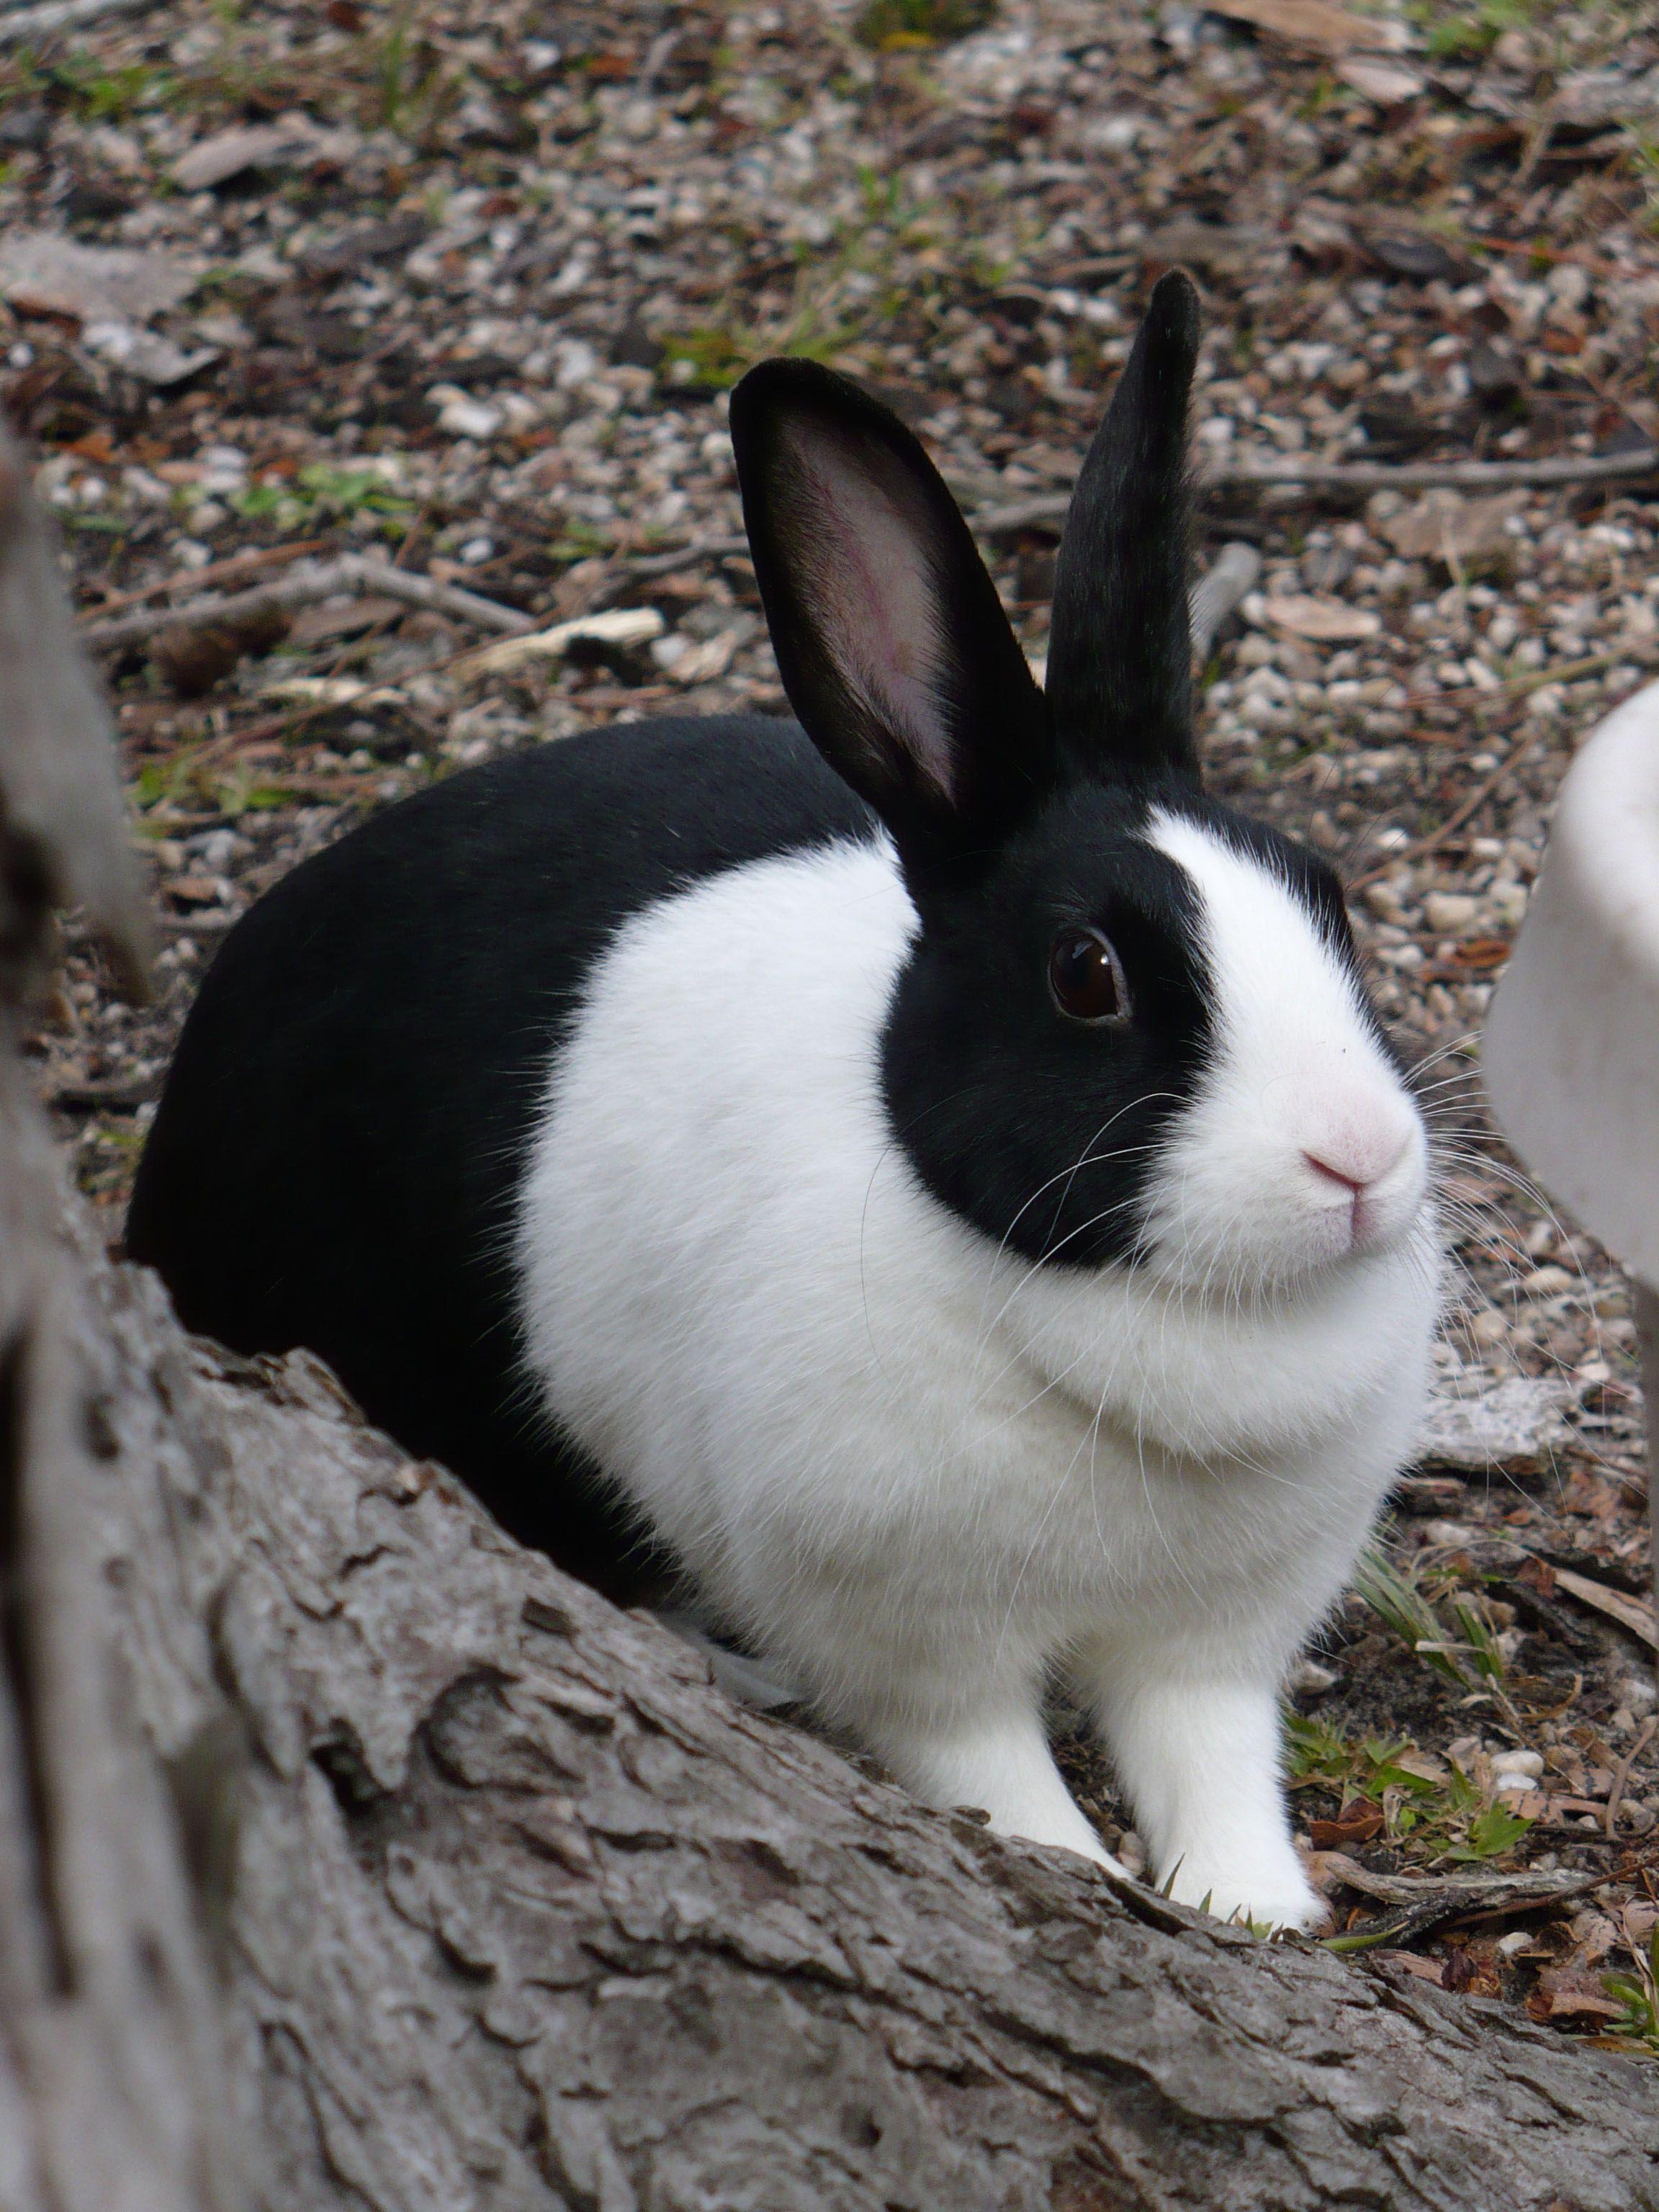 Dutchrabbit 01 Jpg 2304 3072 Pixels Dutch Rabbit Pet Rabbit Cute Animals